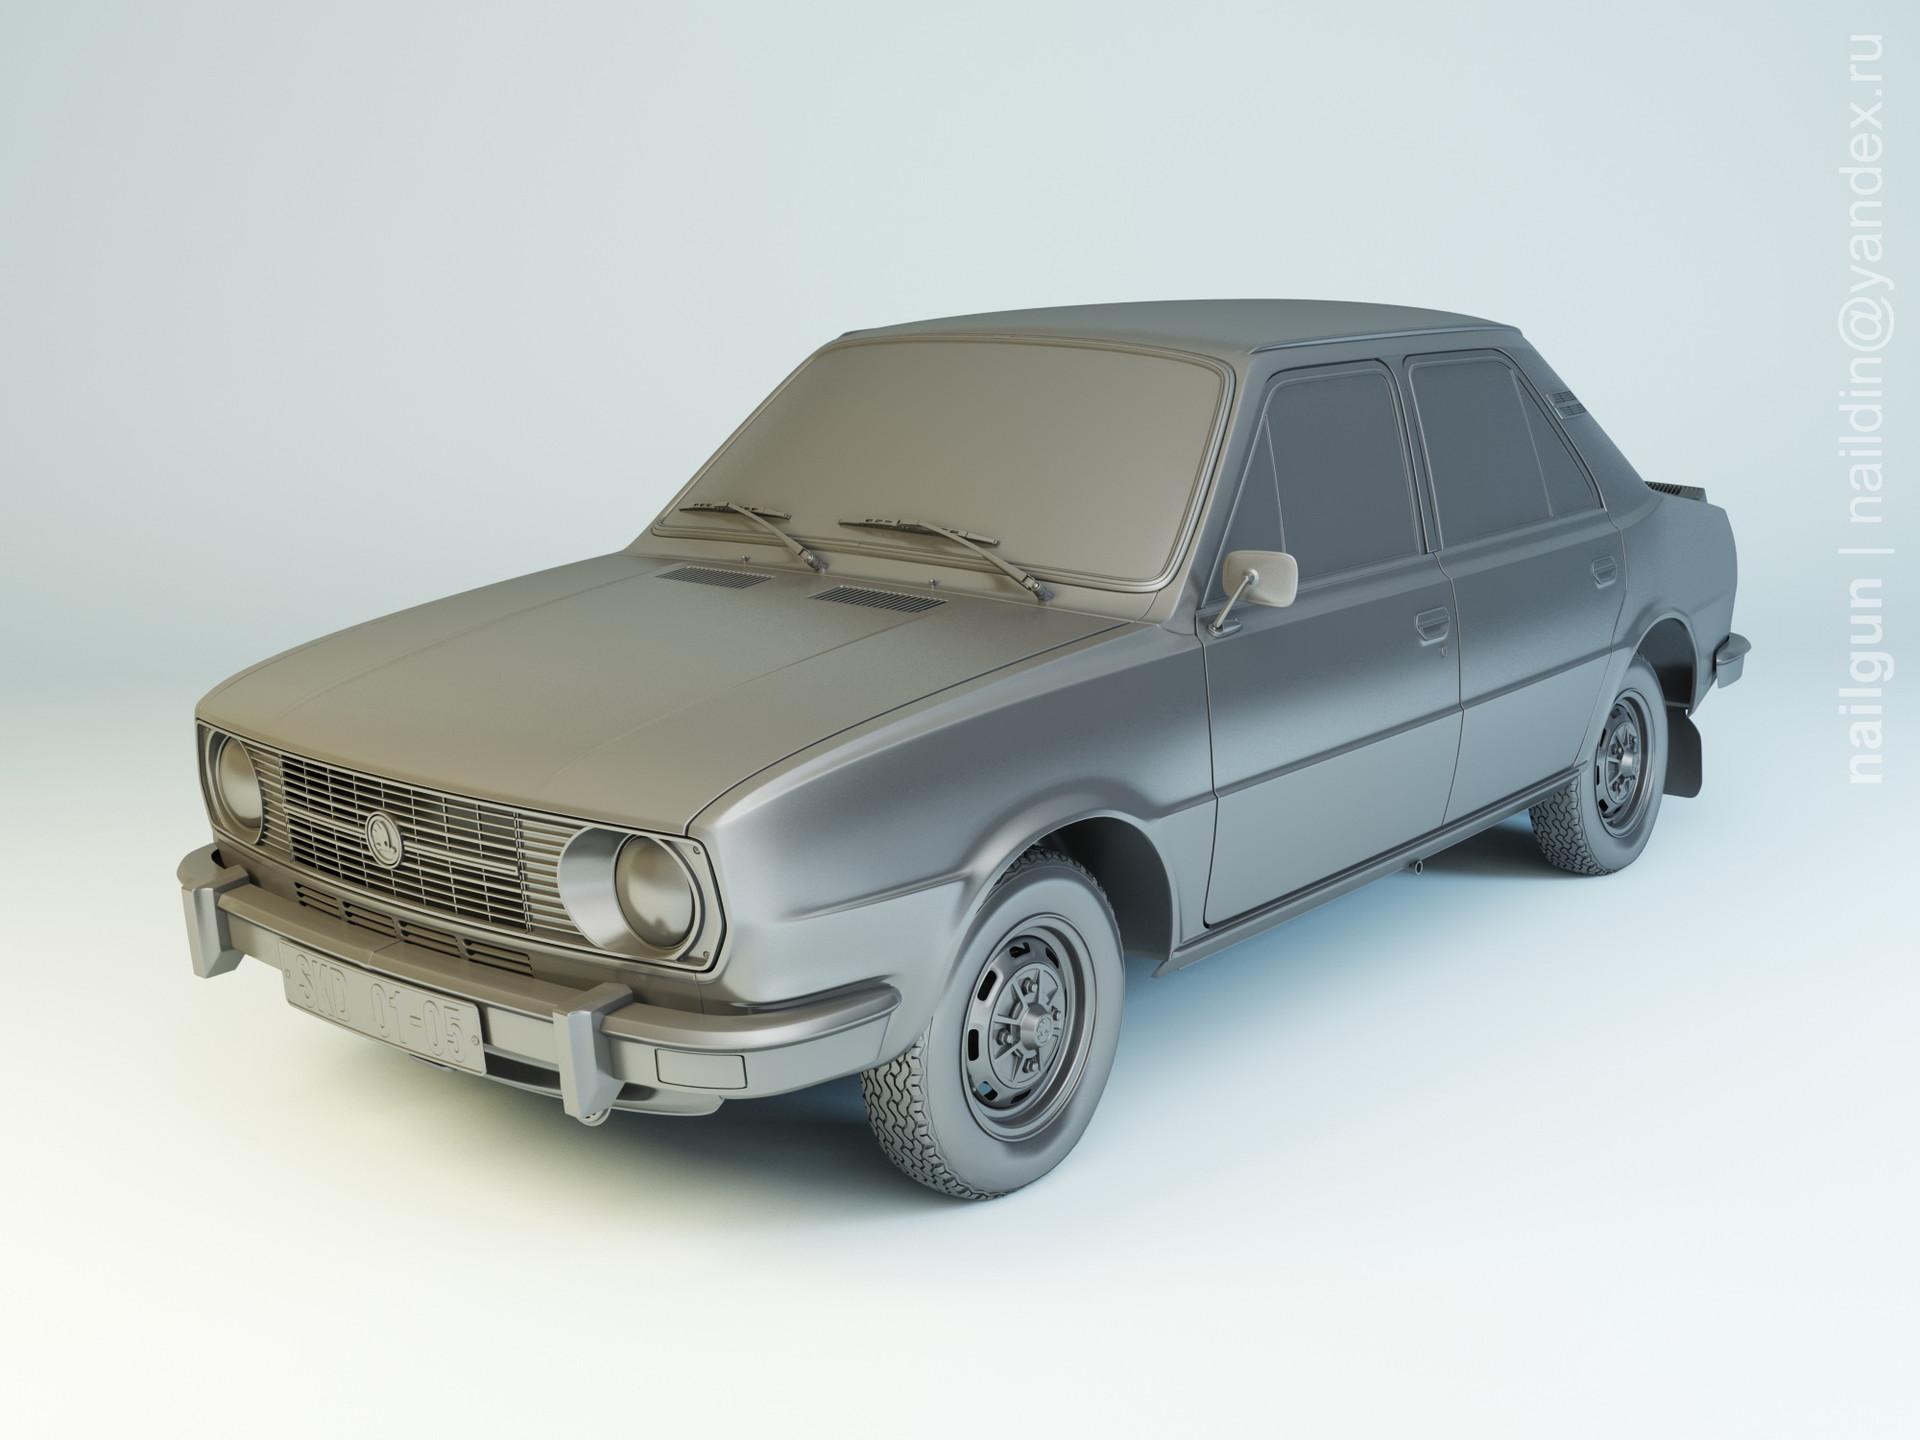 Nail khusnutdinov als 195 002 skoda 105 1980 modelling 0